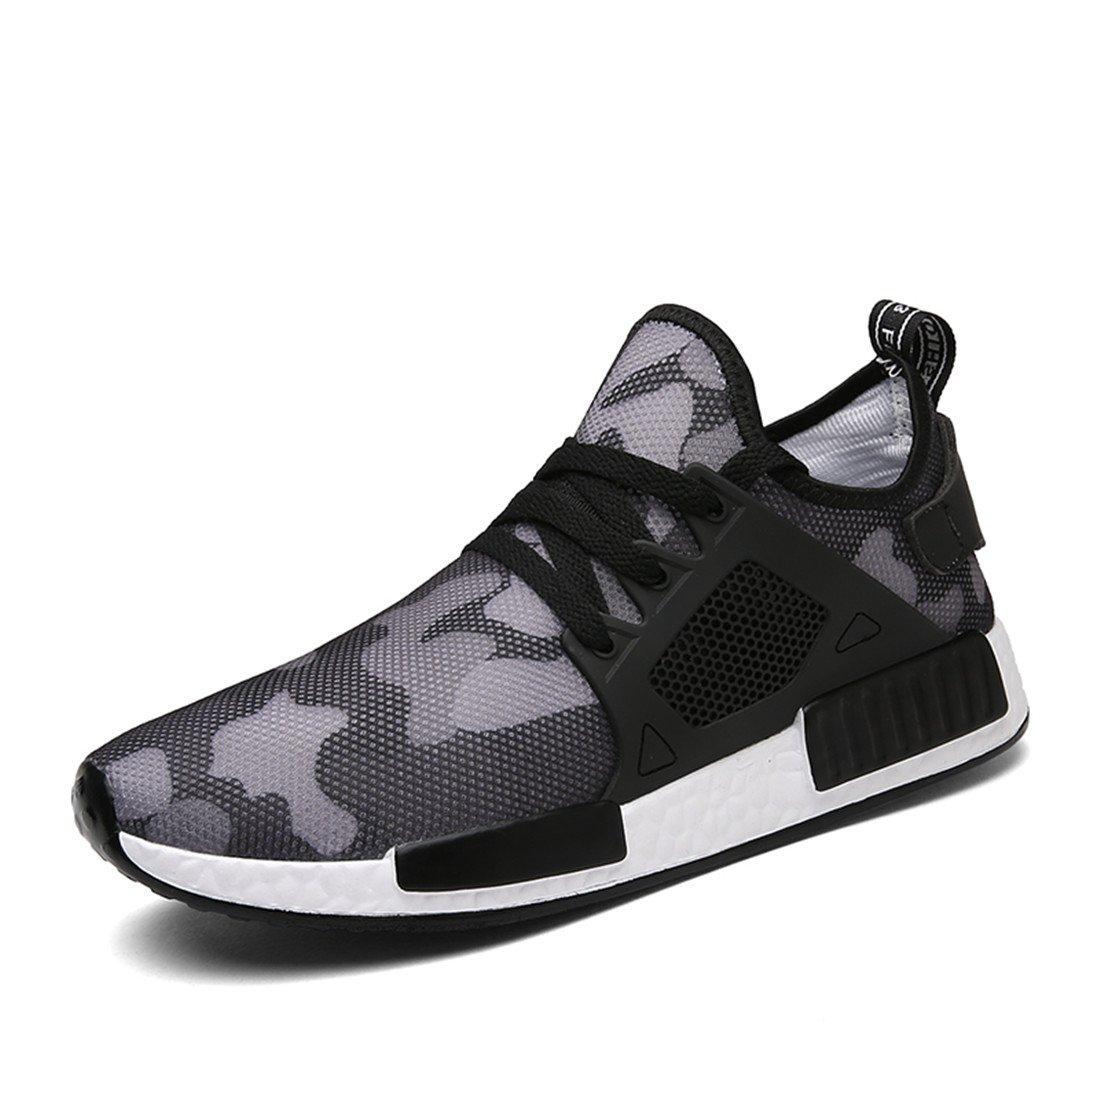 ABeno Men Running Shoes Lightweight Couples Fashion Hit Color Sports Shoes B0757JBNML 11.5 D(M) US|Grey